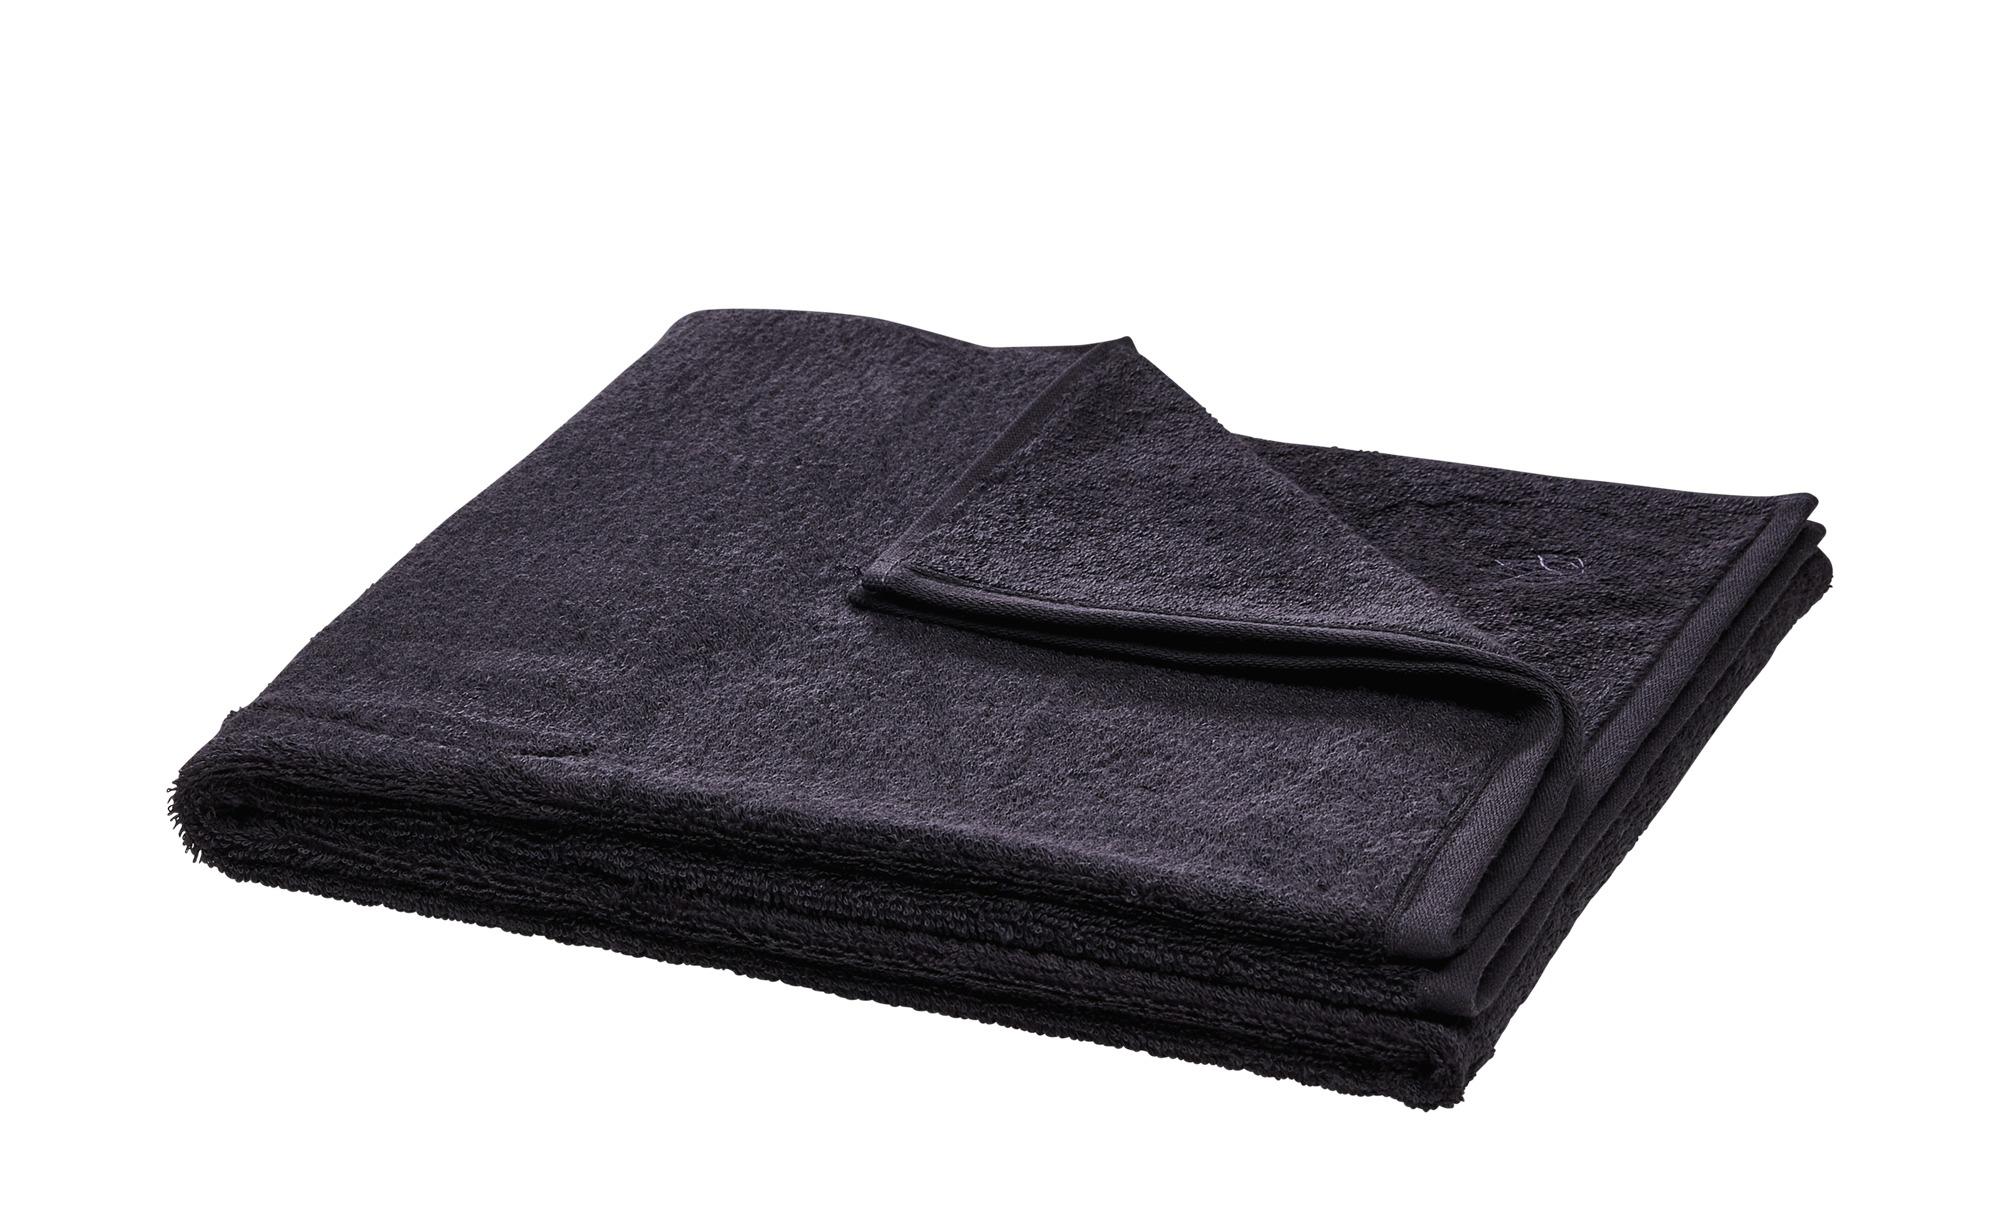 LAVIDA Duschtuch  Touch ¦ grau ¦ 100% Baumwolle ¦ Maße (cm): B: 67 Badtextilien und Zubehör > Handtücher & Badetücher > Duschtücher - Höffner